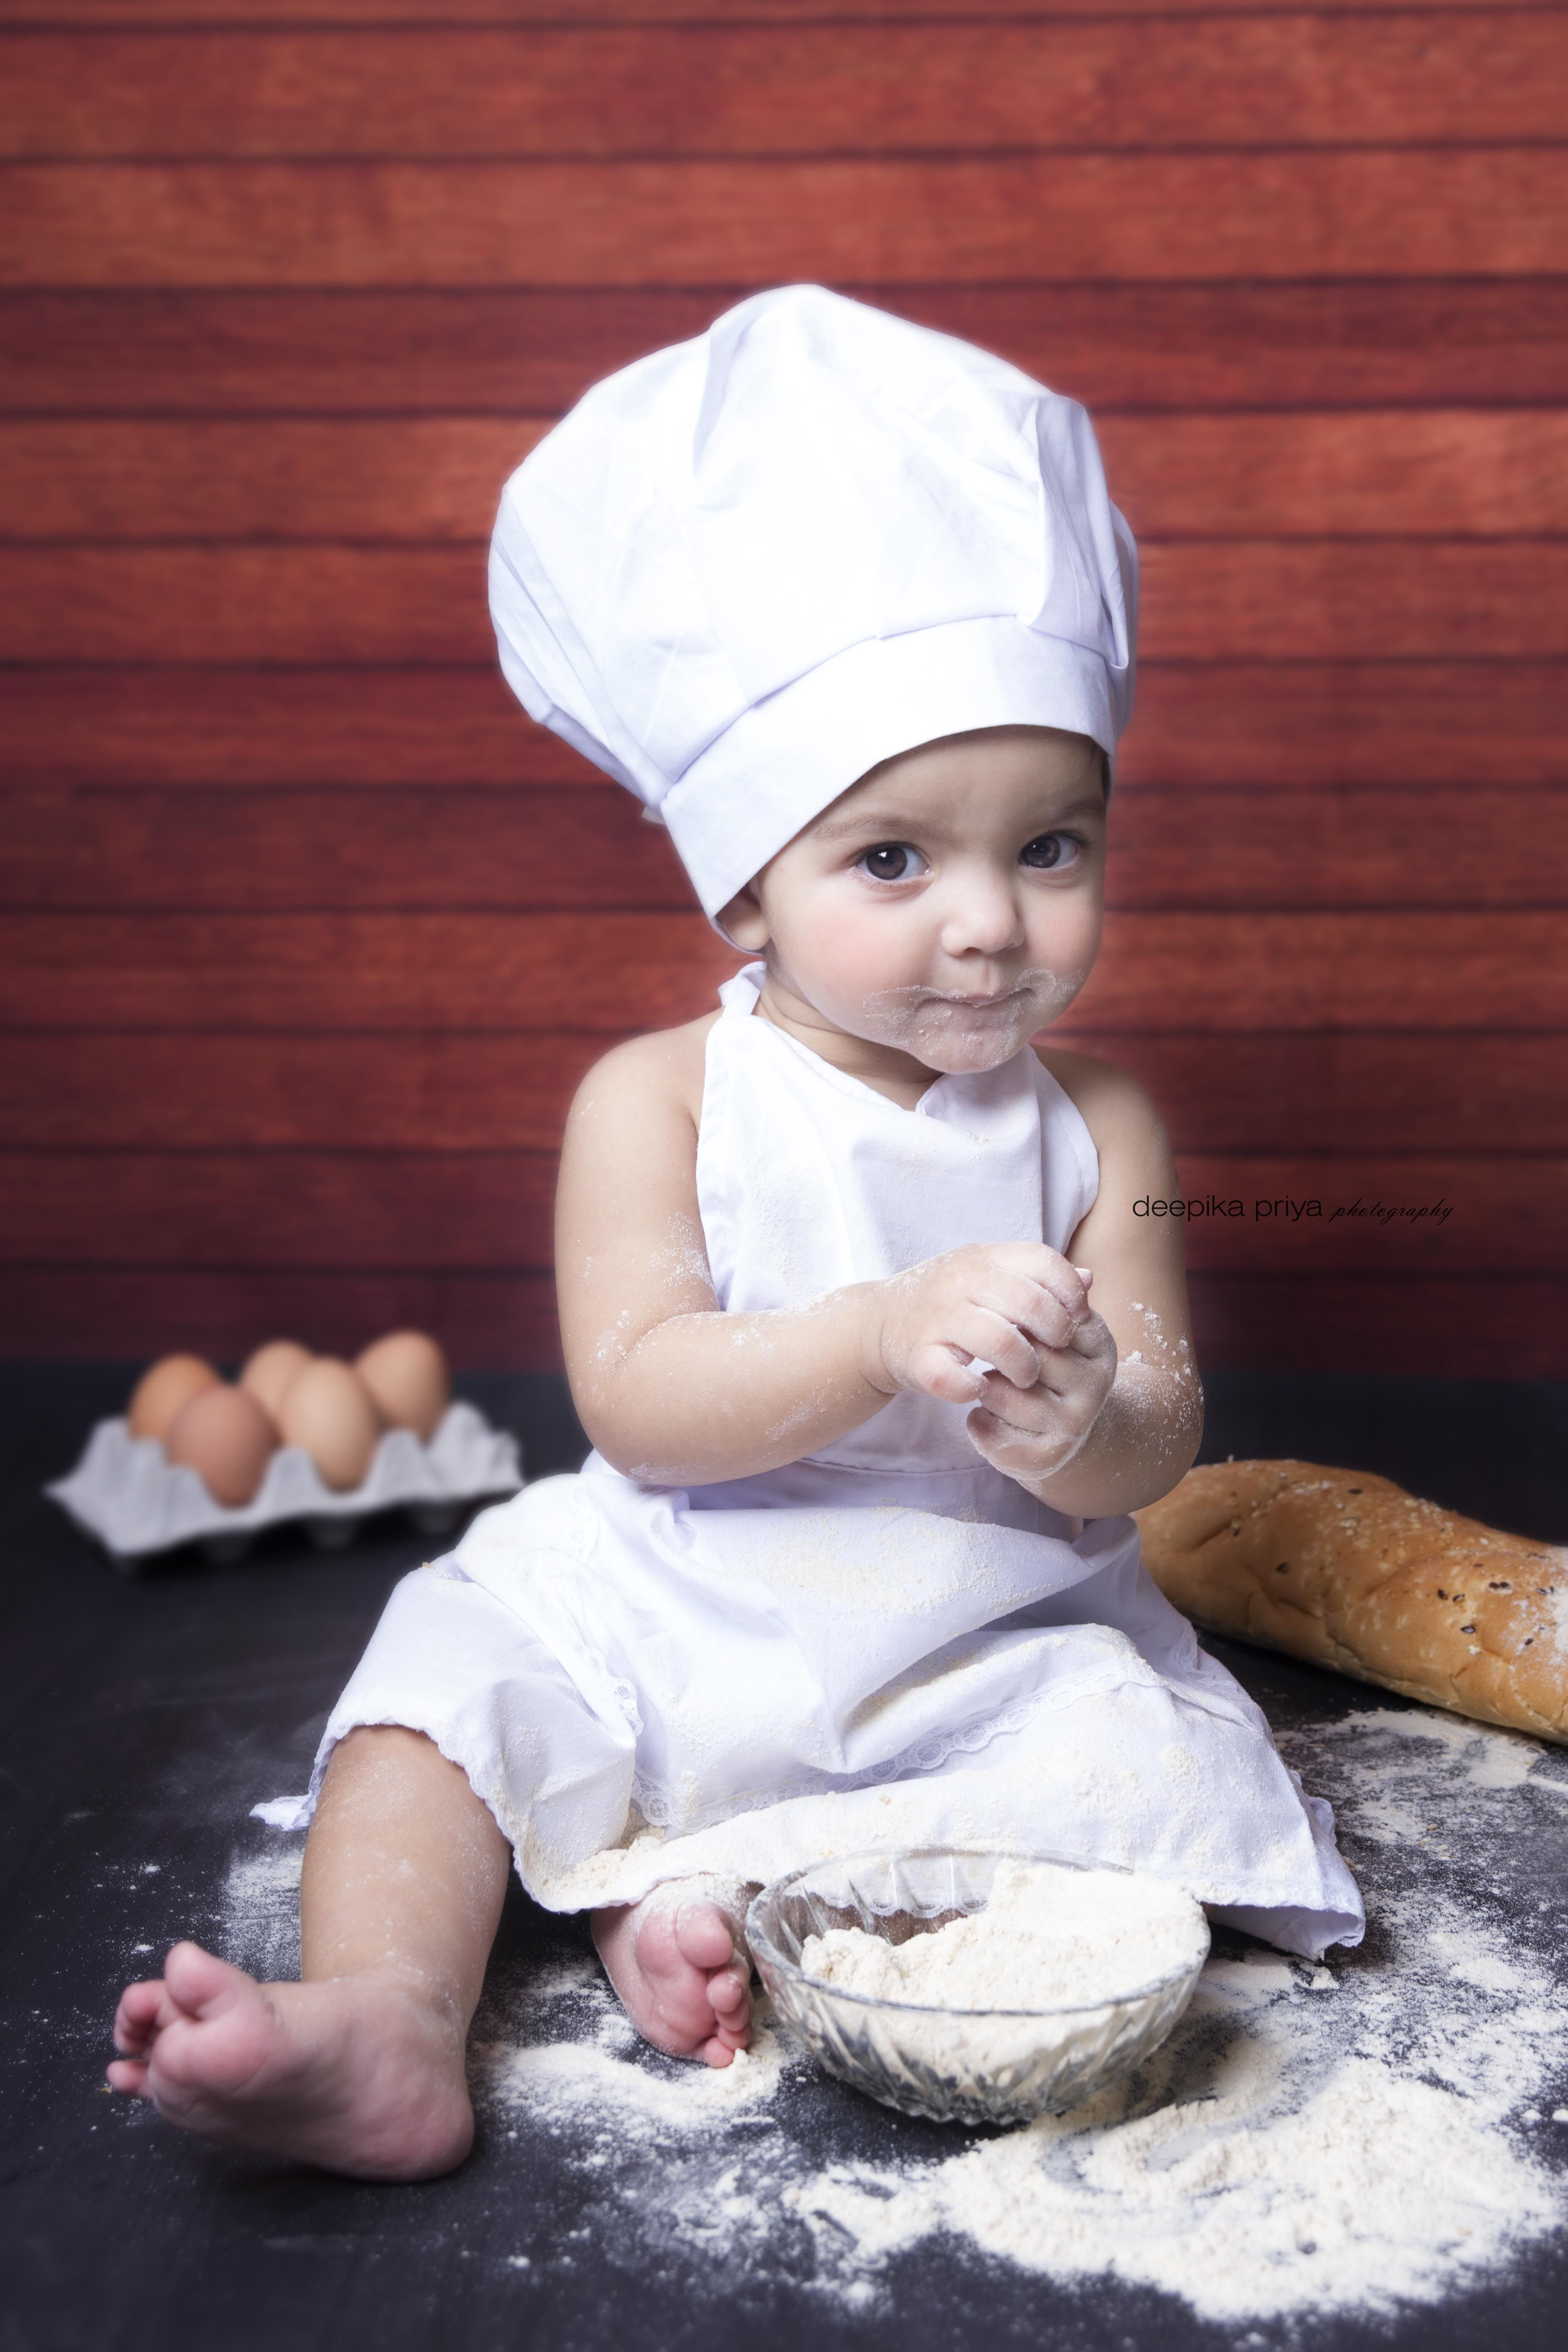 Master chef deepika priya photography deepika priya adorable kid infant photoshoot baby girl baker theme chef set lovely picture